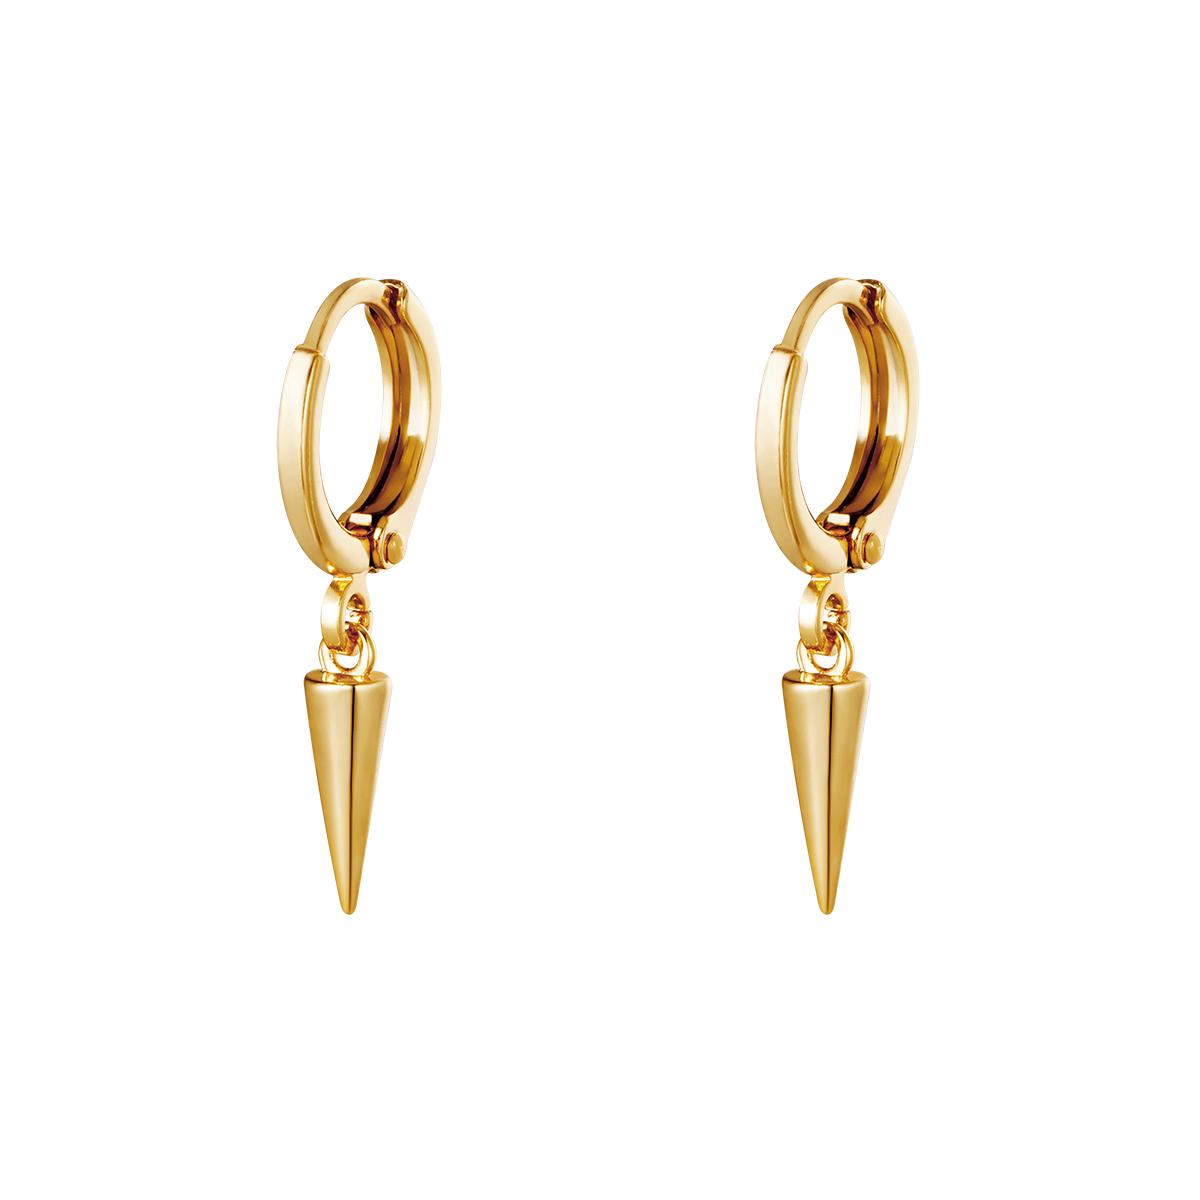 Earrings Dangling Cone